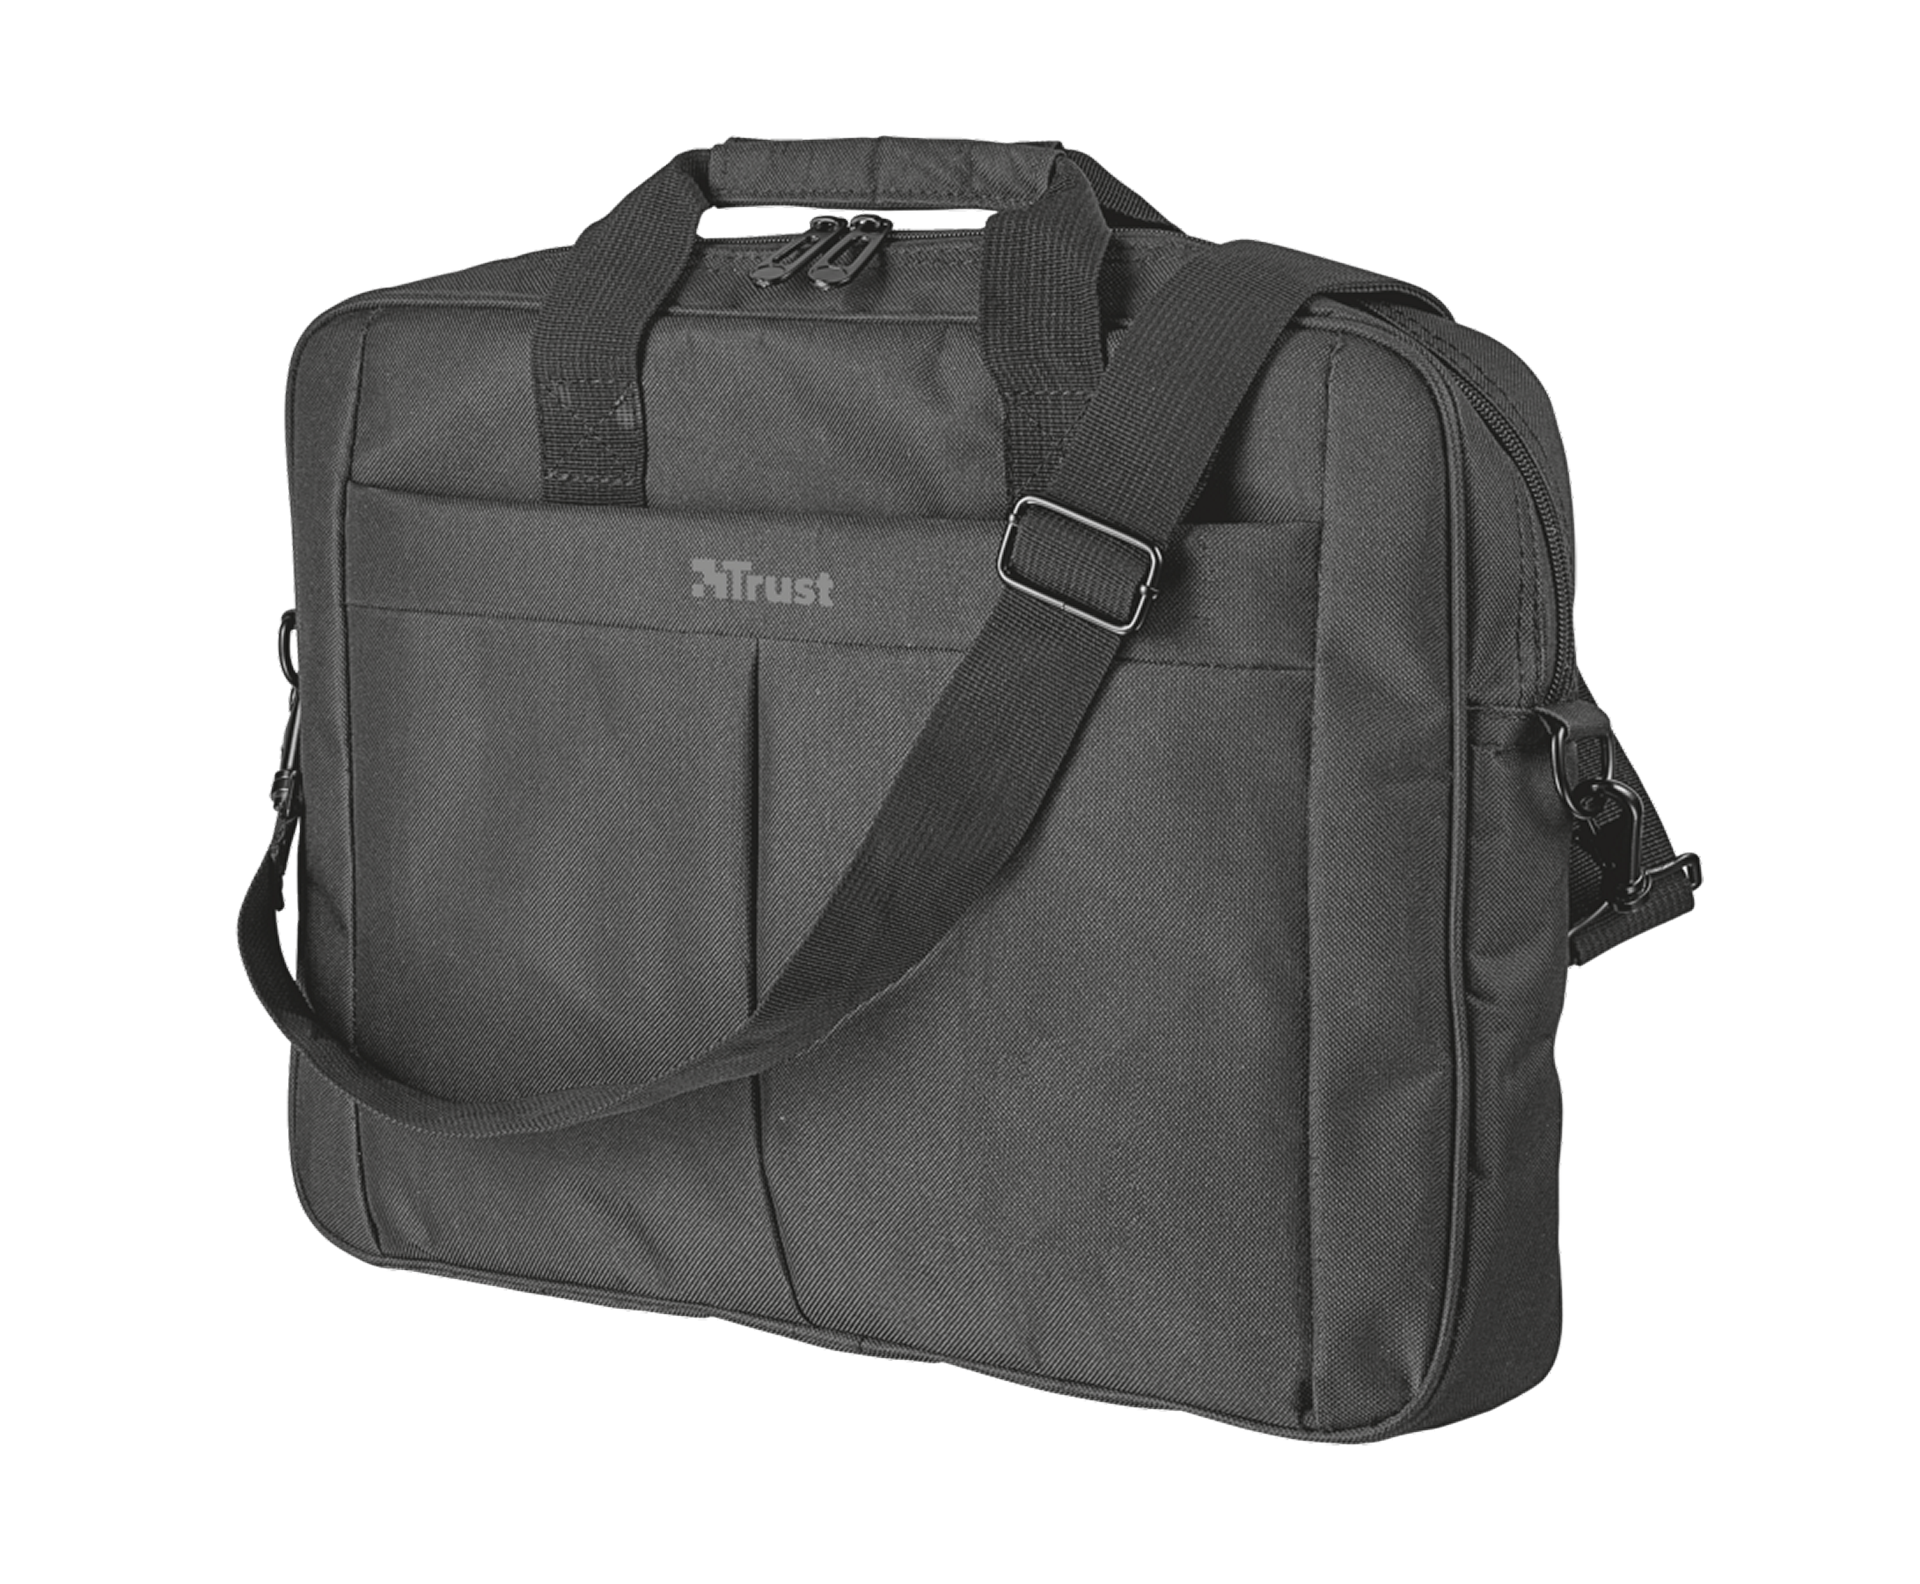 "brašna TRUST Primo Carry Bag for 16"" laptops"